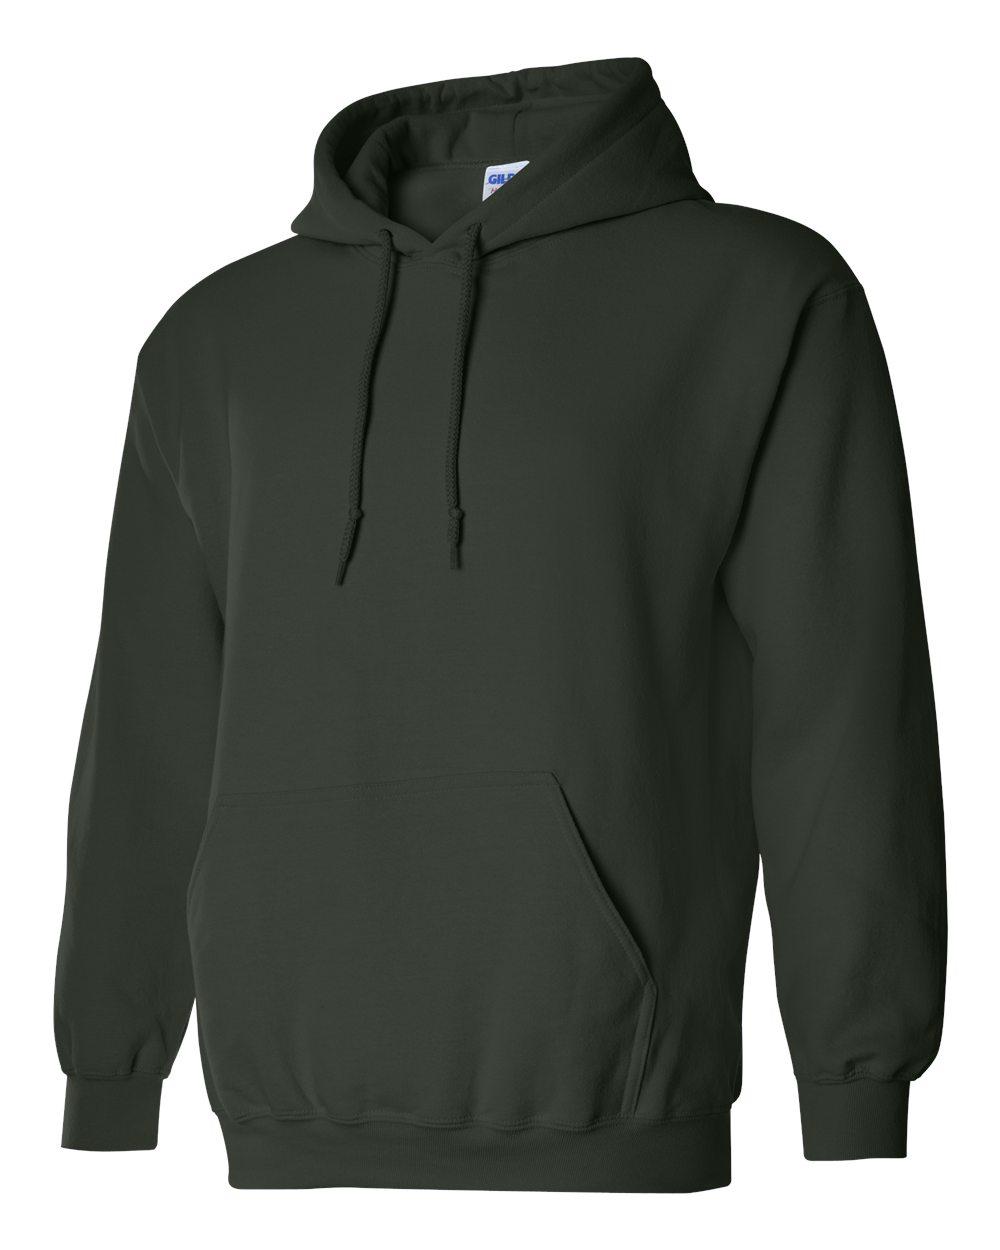 Gildan Heavy Blend Hooded Sweatshirt GI18500 Forest Green